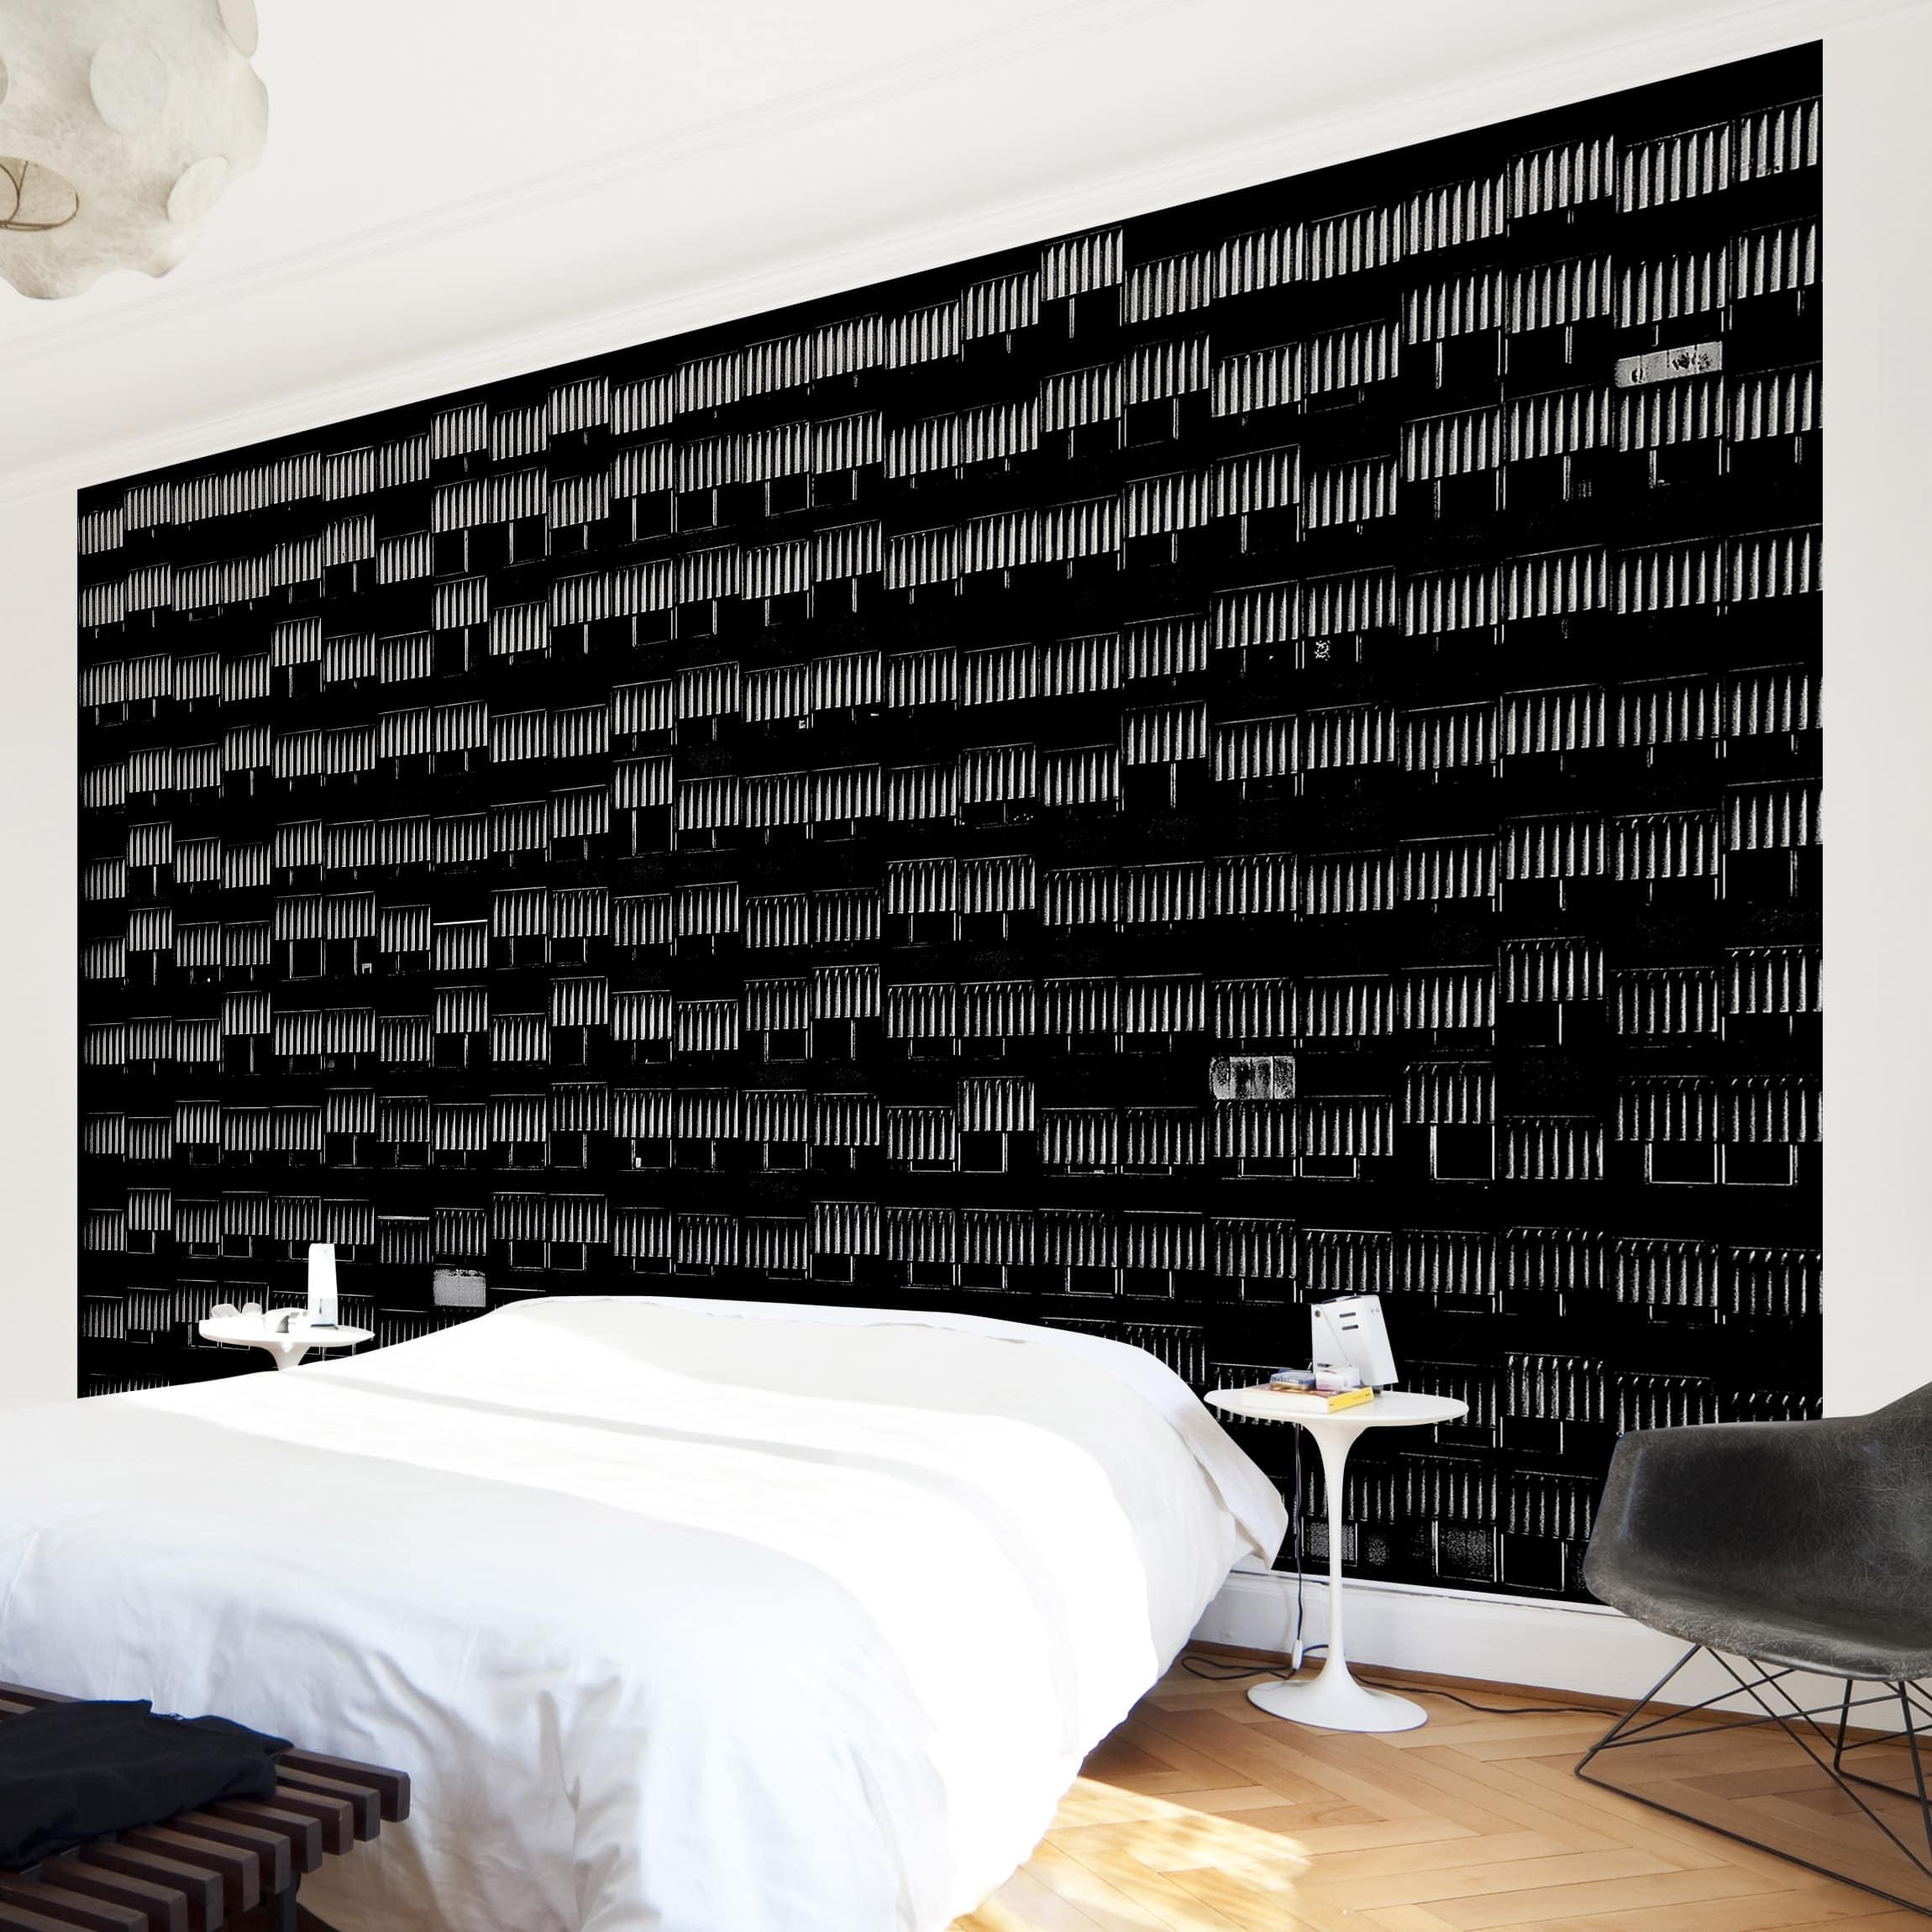 tapete selbstklebend way of life wandbild querformat. Black Bedroom Furniture Sets. Home Design Ideas